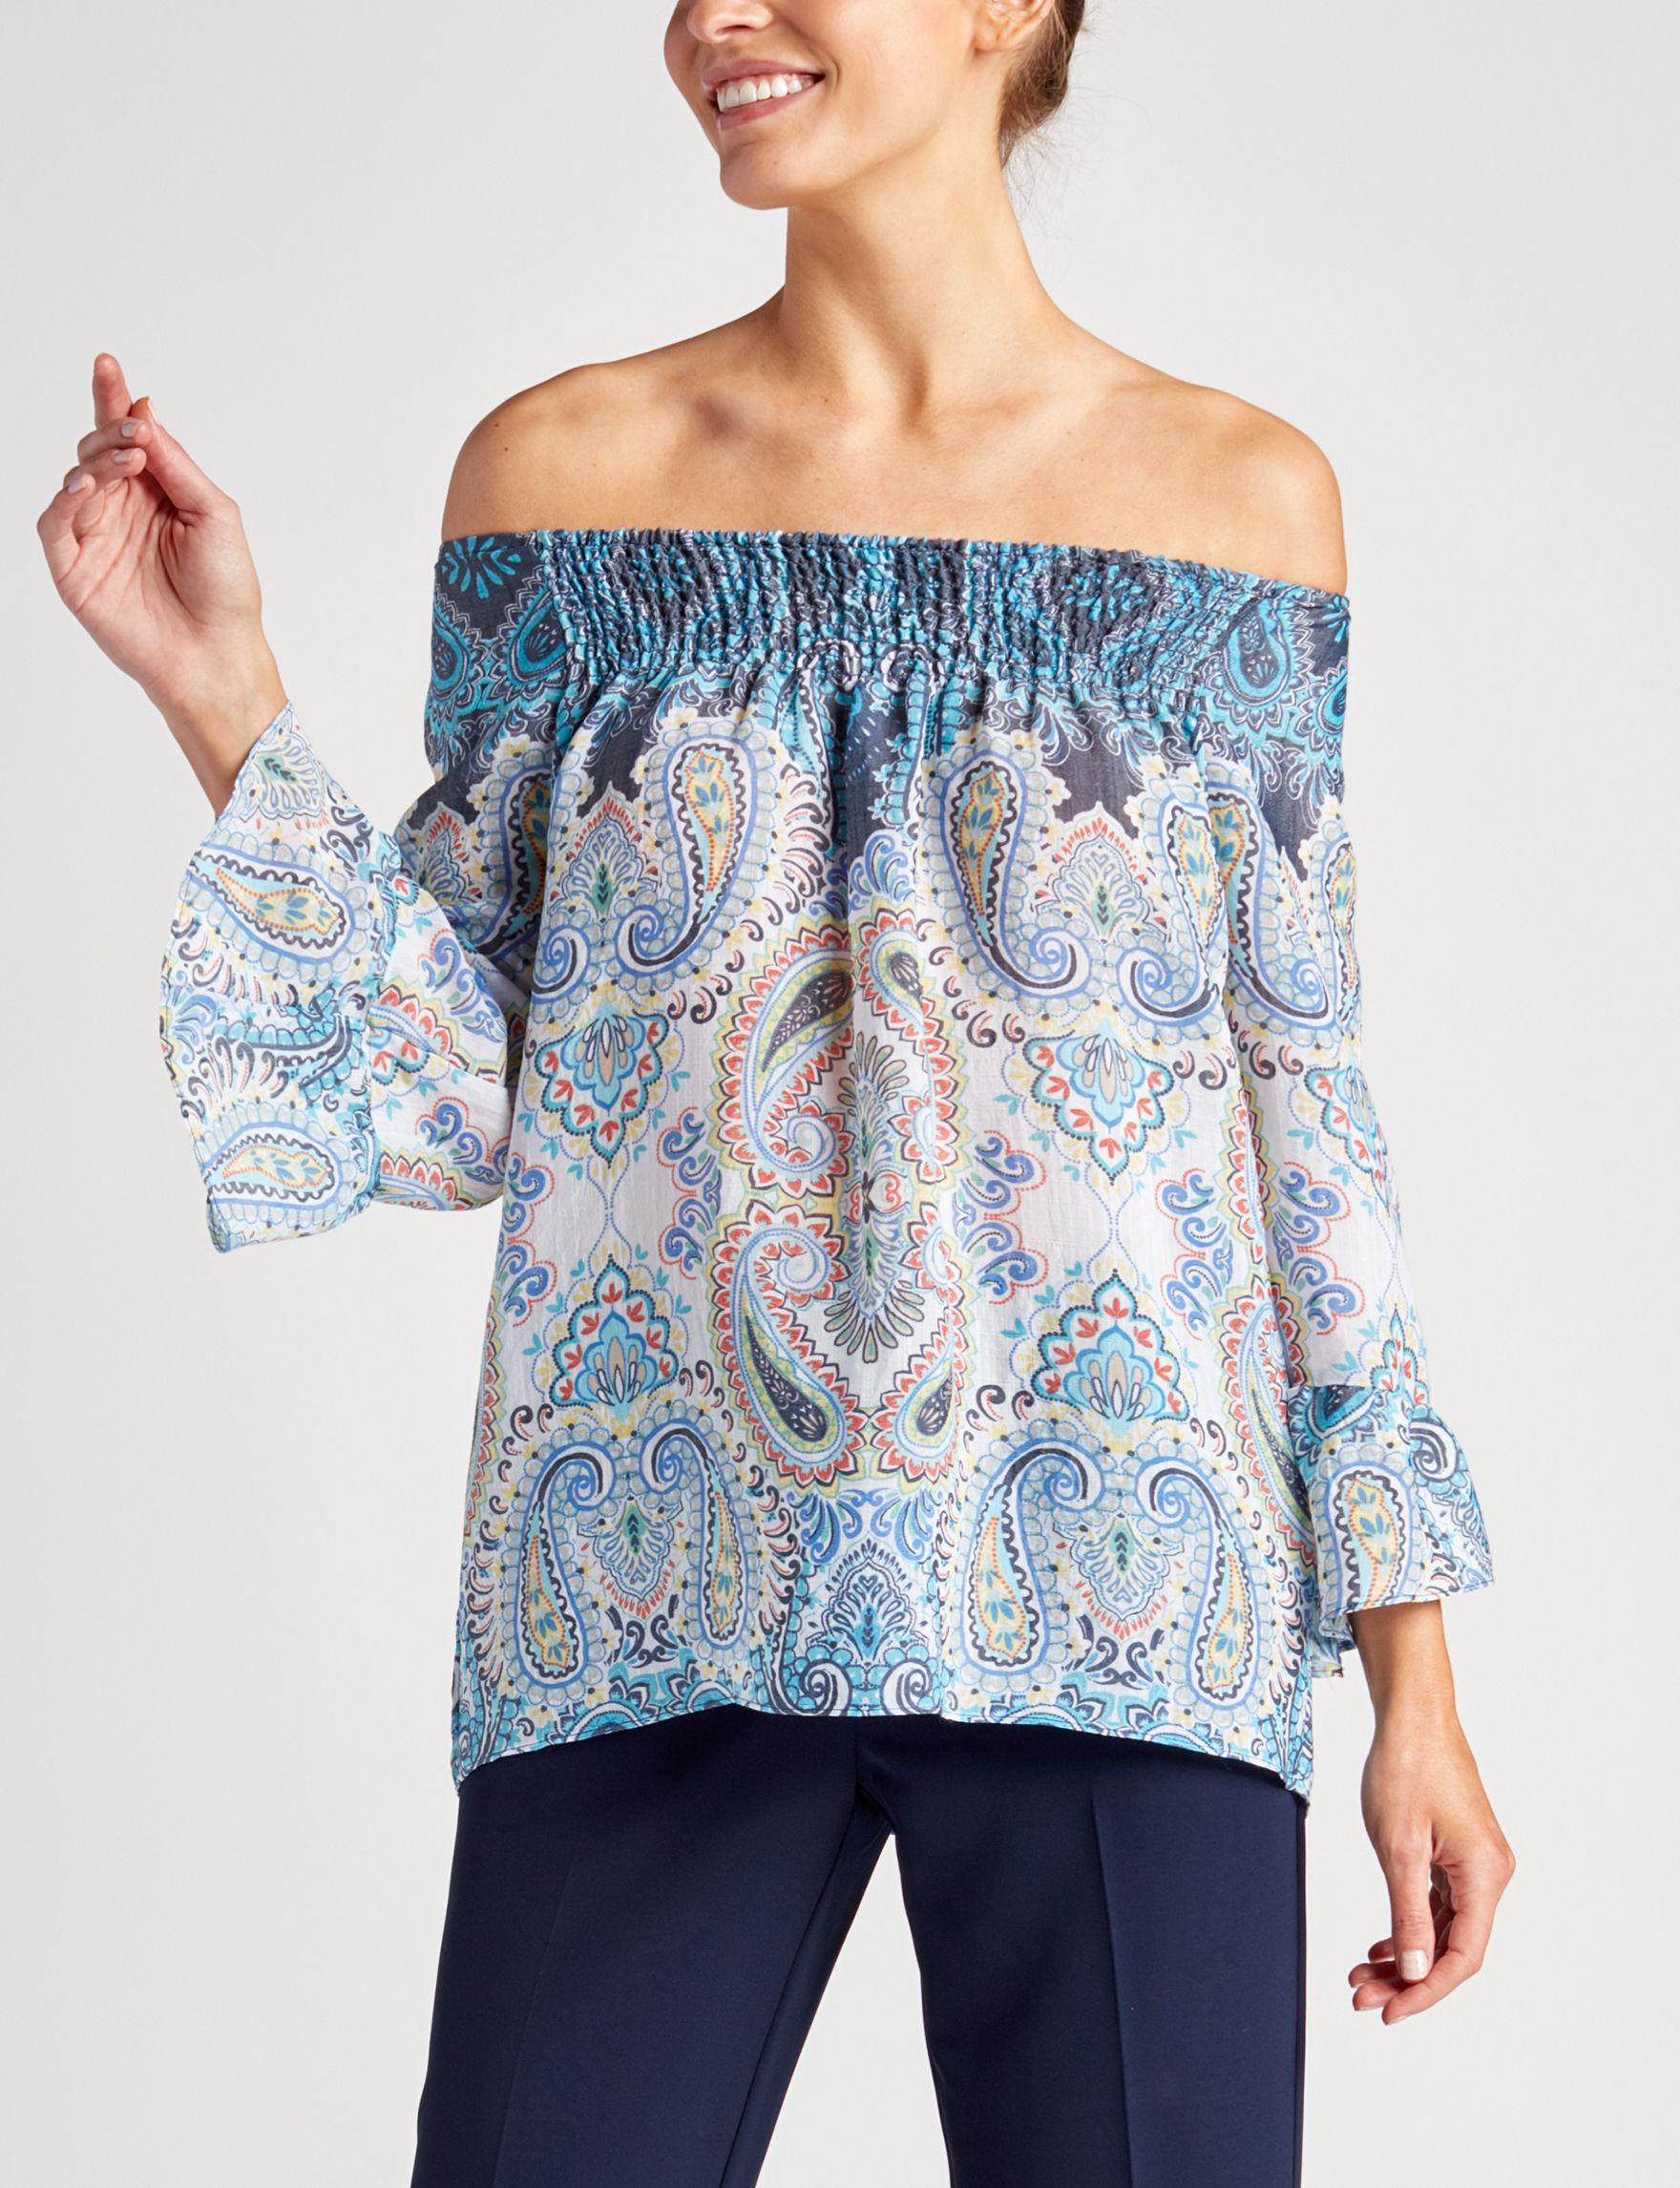 Zac & Rachel Blue Multi Shirts & Blouses